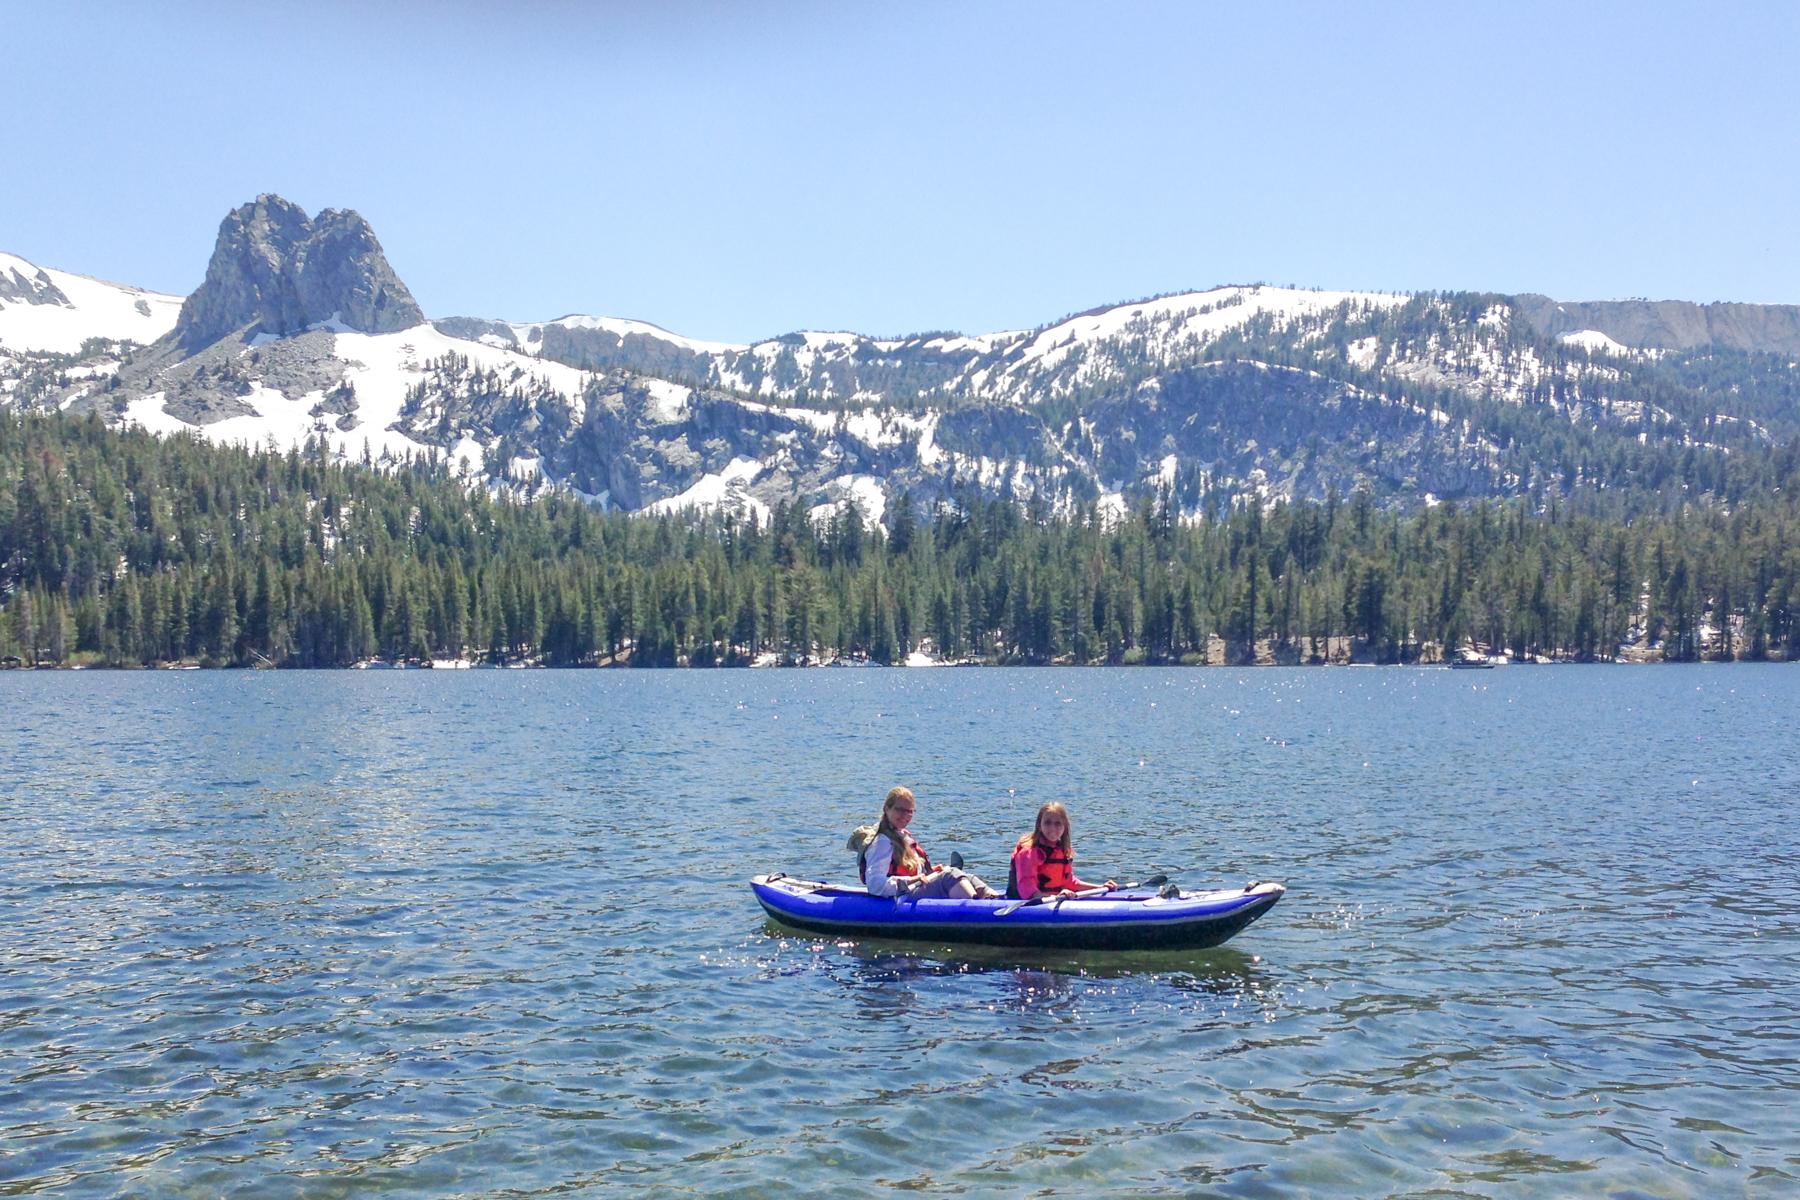 Sonja kayaking with Hana on Lake Mary. Mammoth Lakes, CA